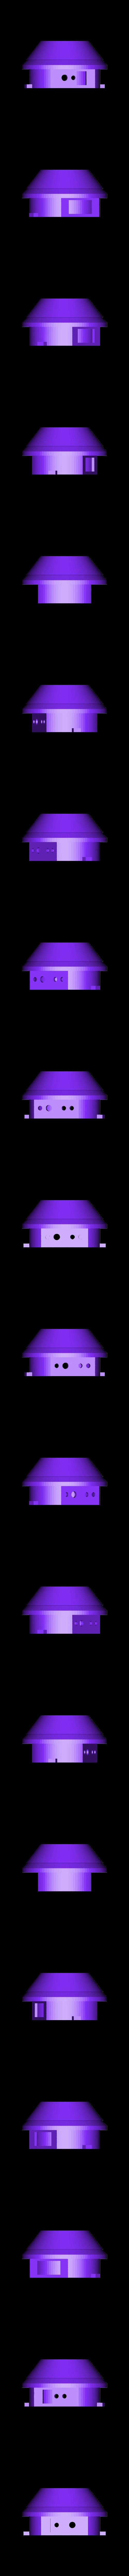 Antigen_bomb_1.stl Download free STL file Star Trek Voyager Antigen Bomb (not real bomb) • 3D printer model, poblocki1982